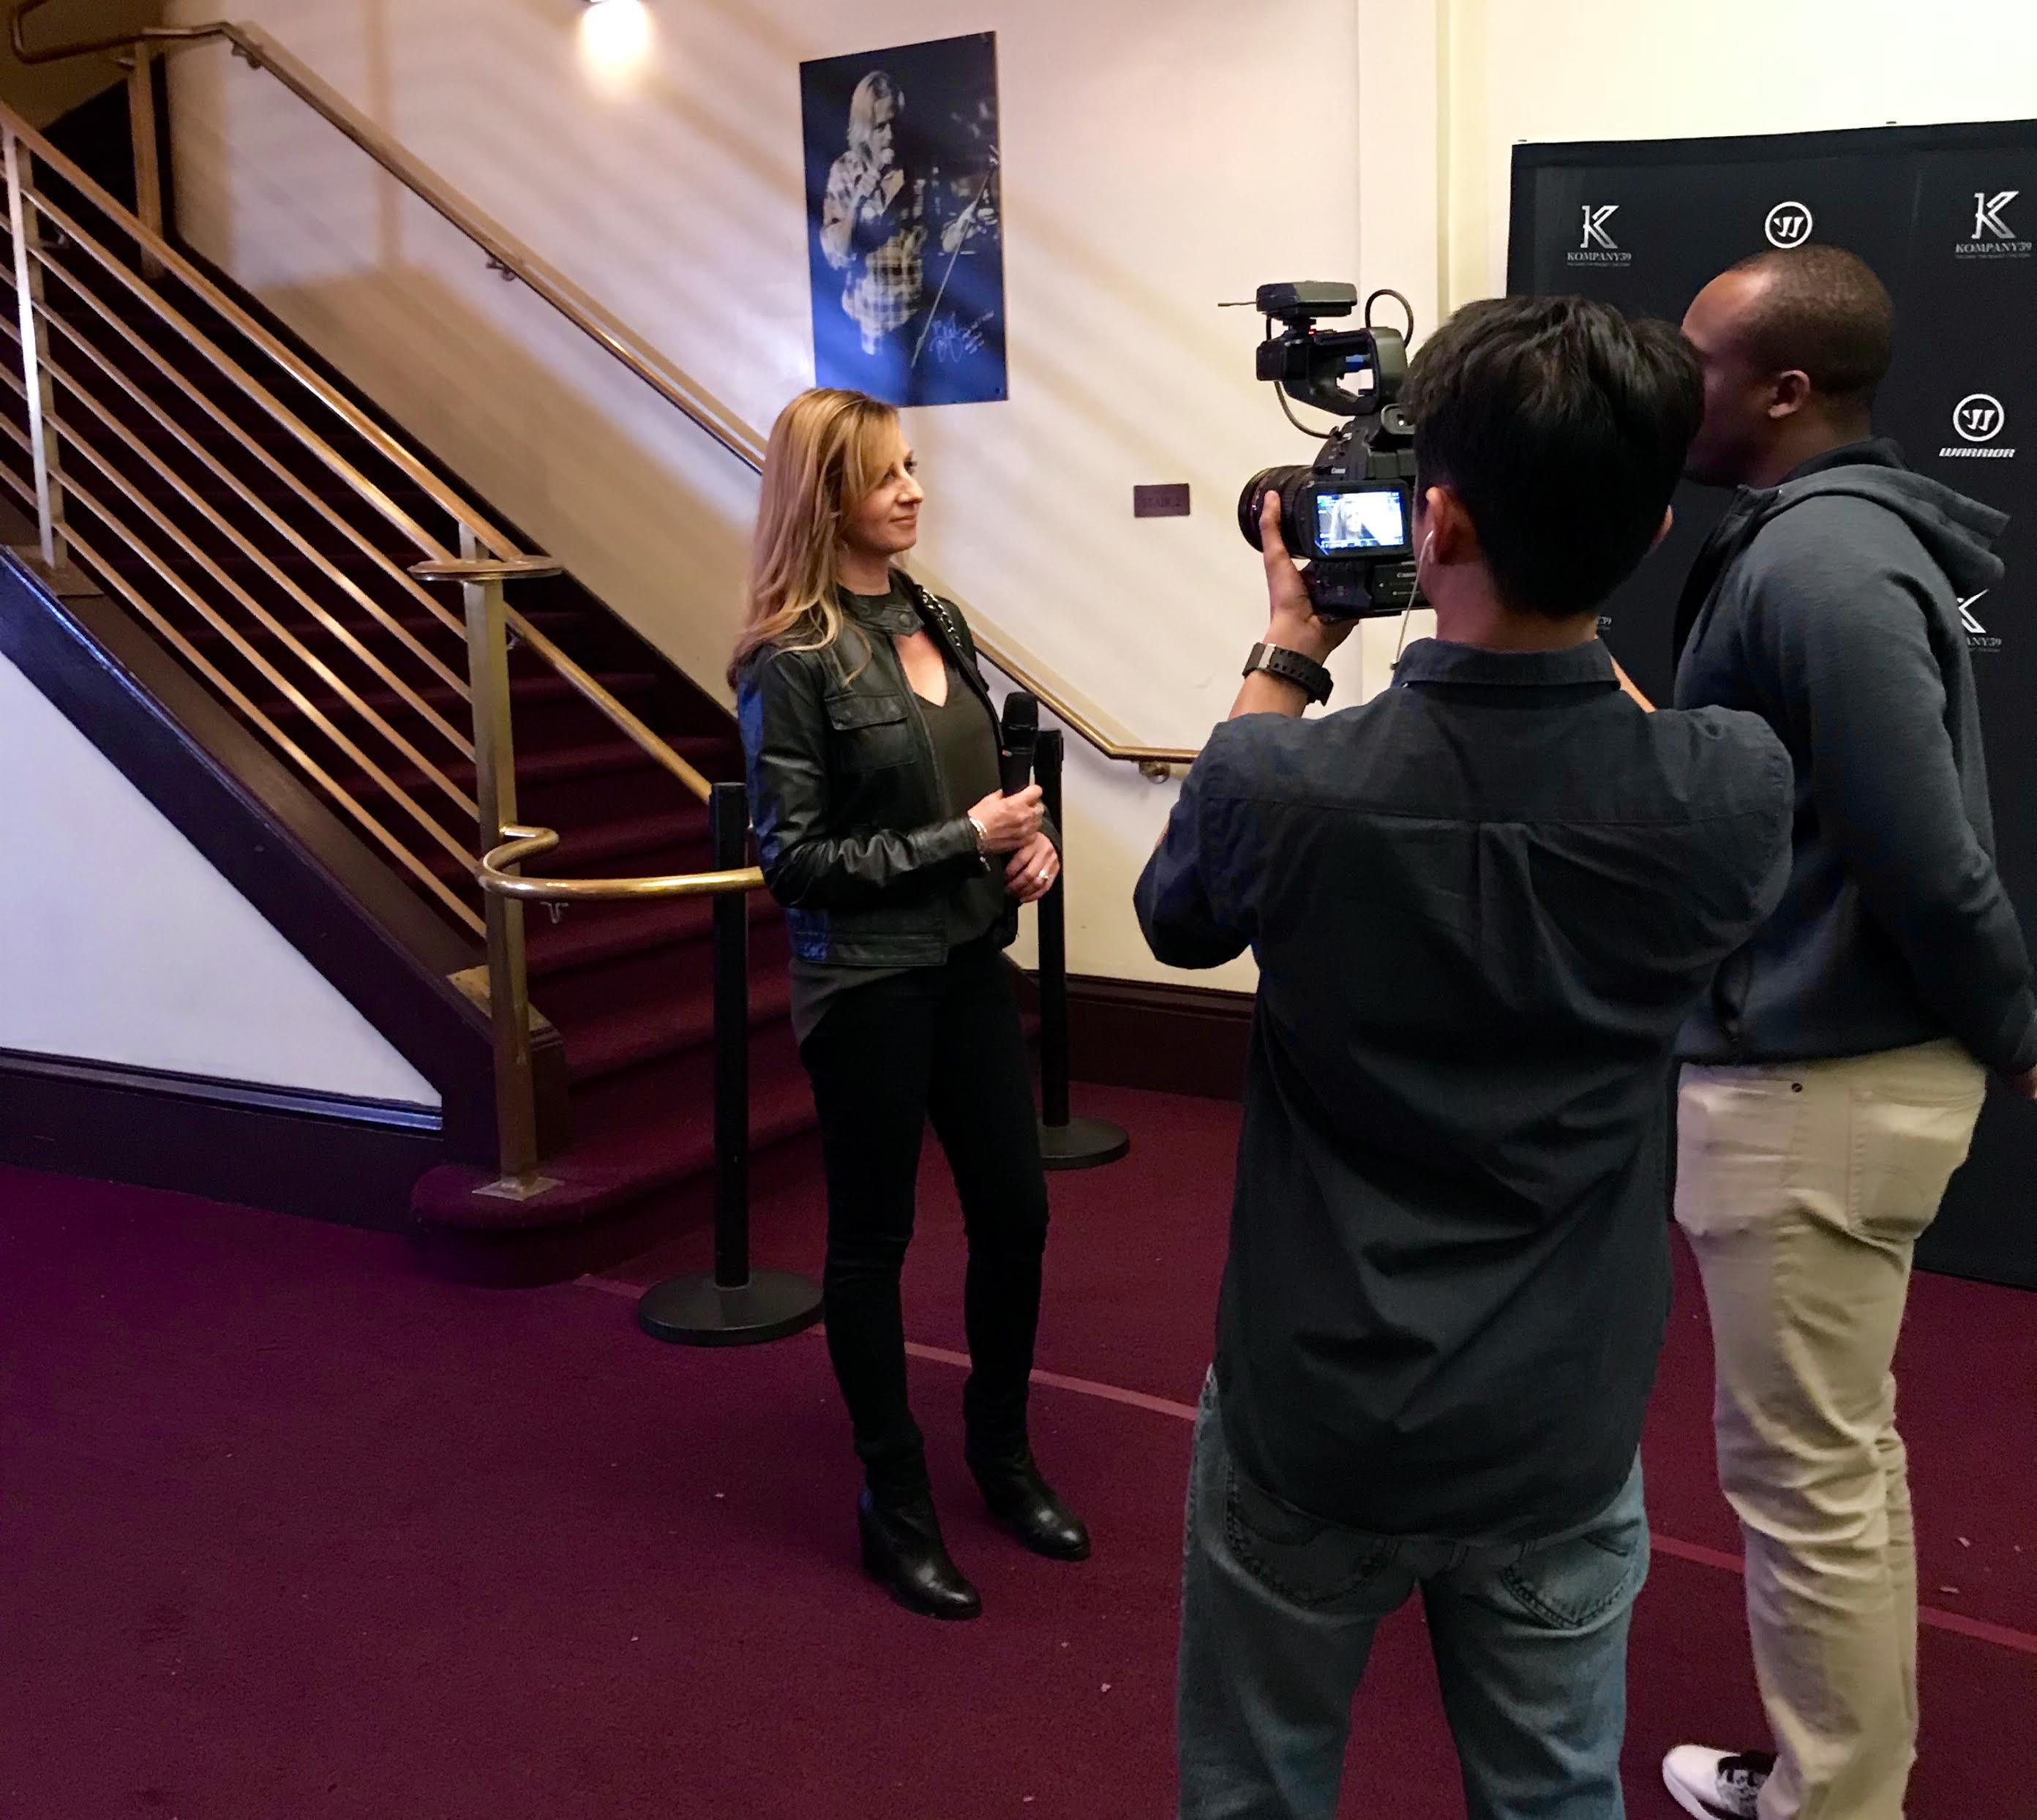 Cathy Andrade interview at Joe Pavelski Kompany39 event